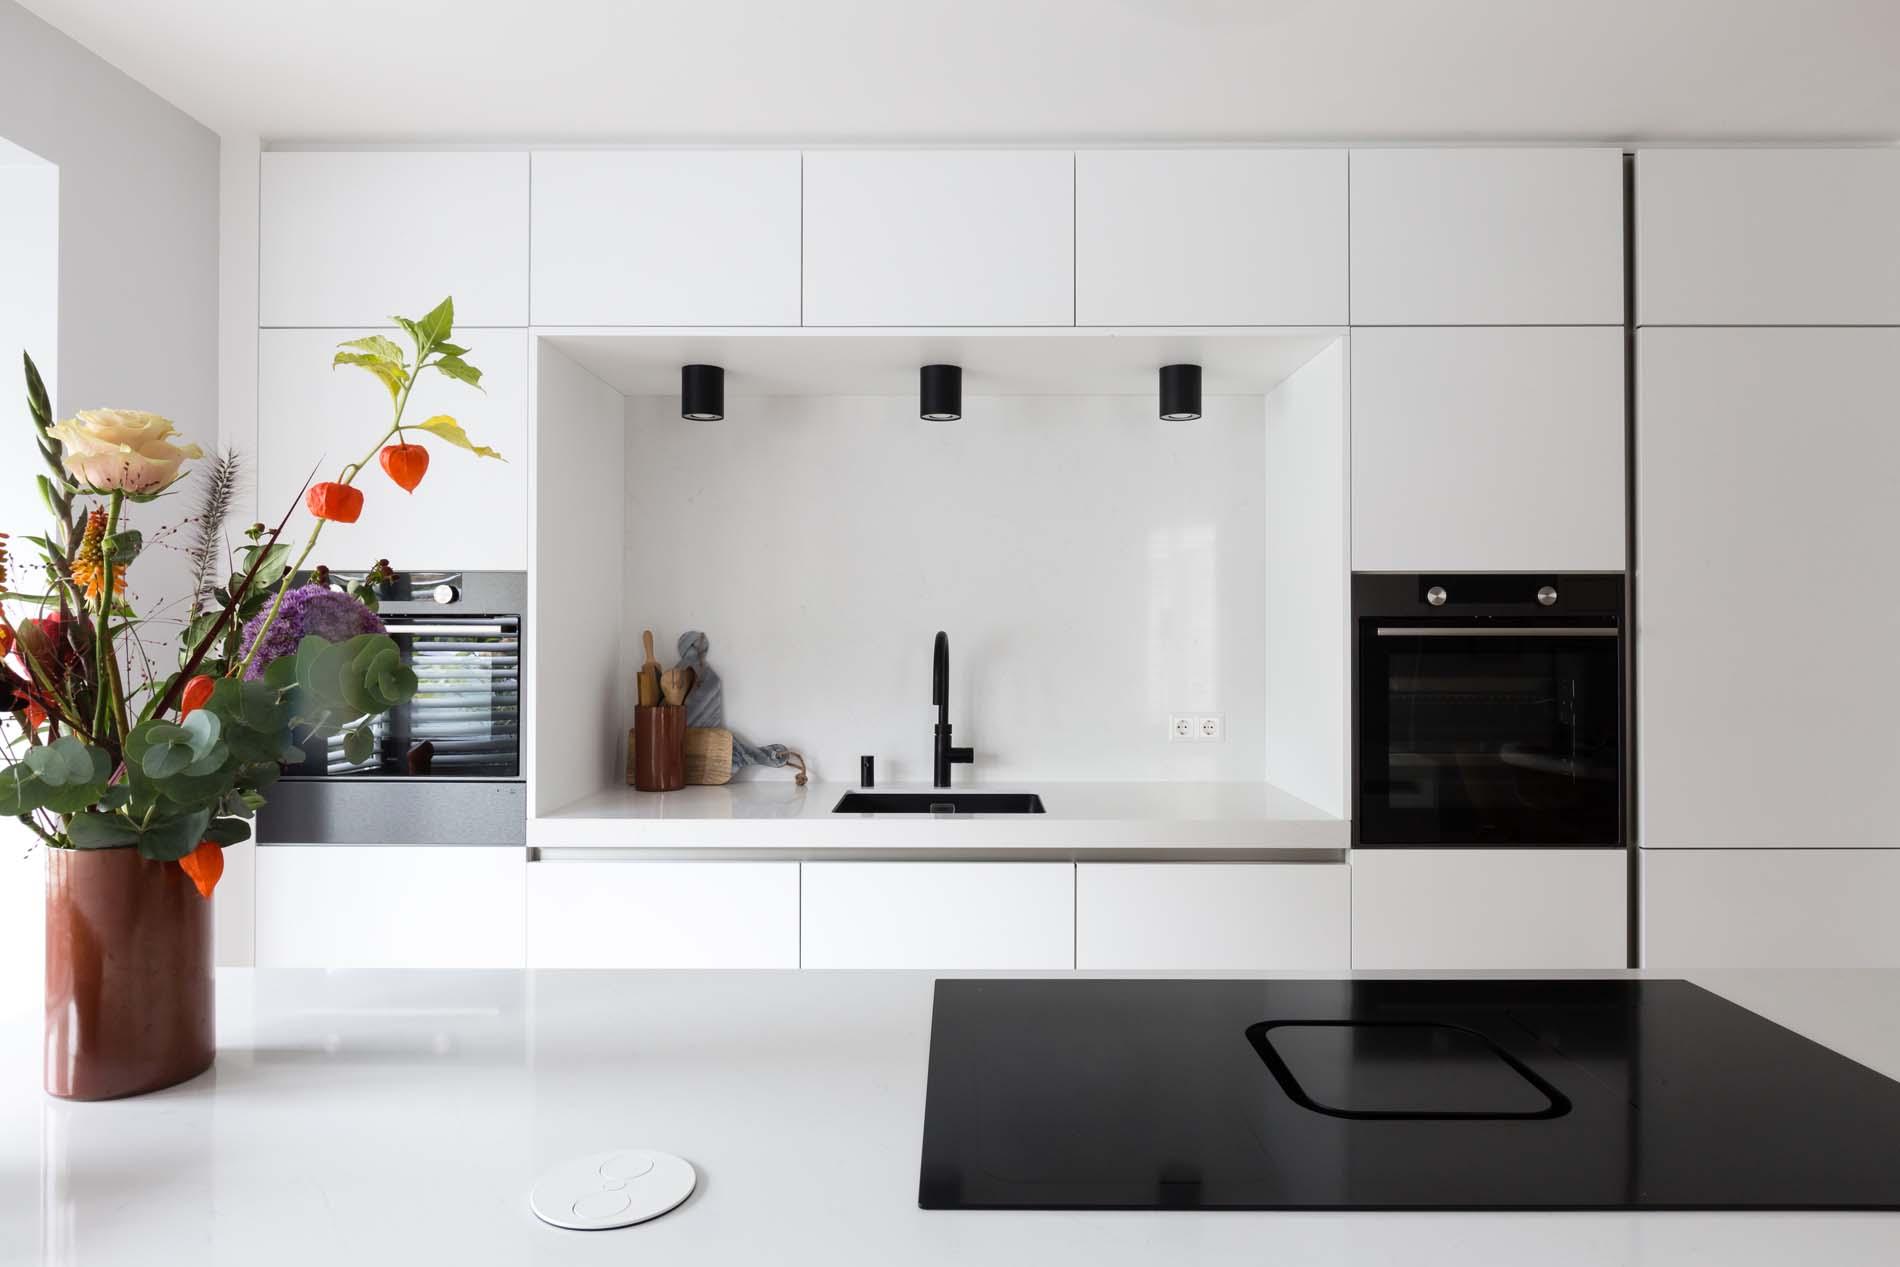 ATAG keukenapparatuur vtwonen keuken witte keuken met zwarte apparatuur, ASWA Keukens